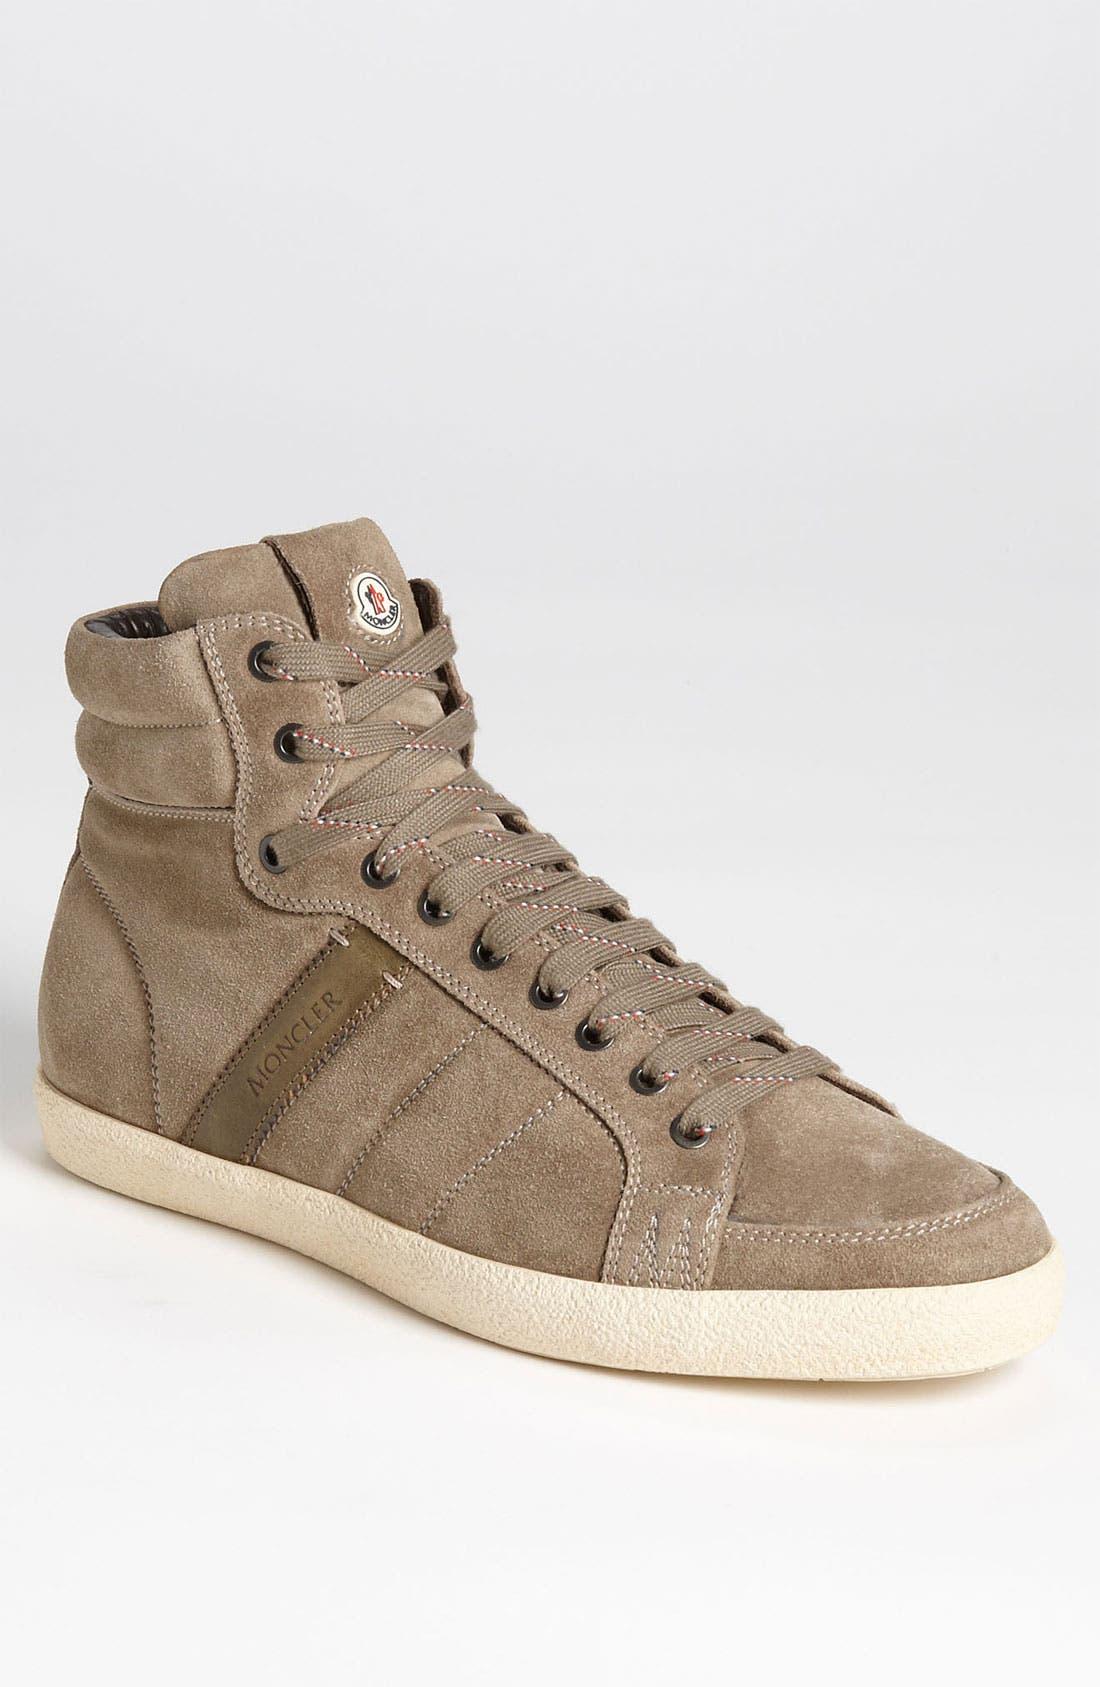 Alternate Image 1 Selected - Moncler 'Lyon' Suede Sneaker (Men)